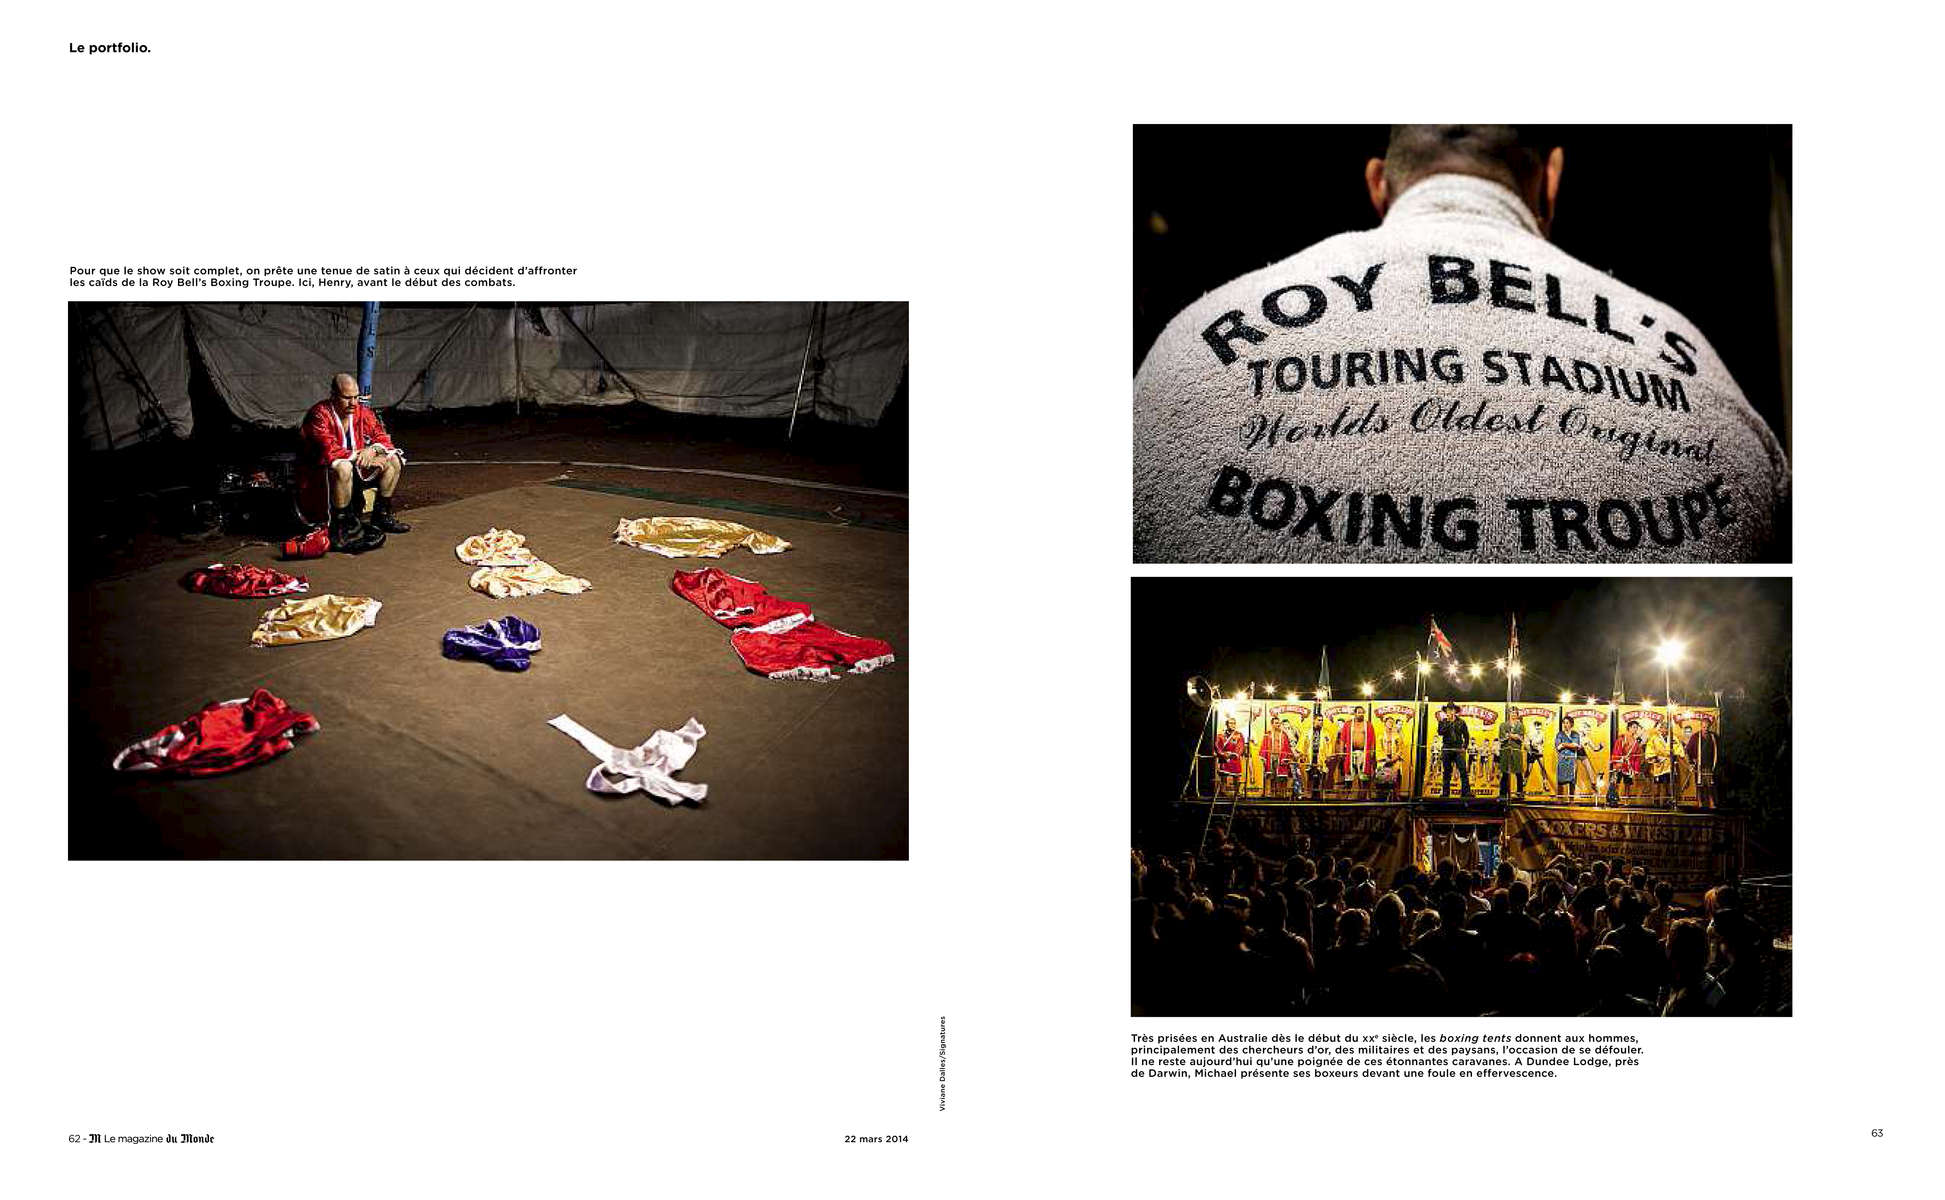 Boxing Tent, AustraliaFrench magazine, M (Le Monde), March 2014